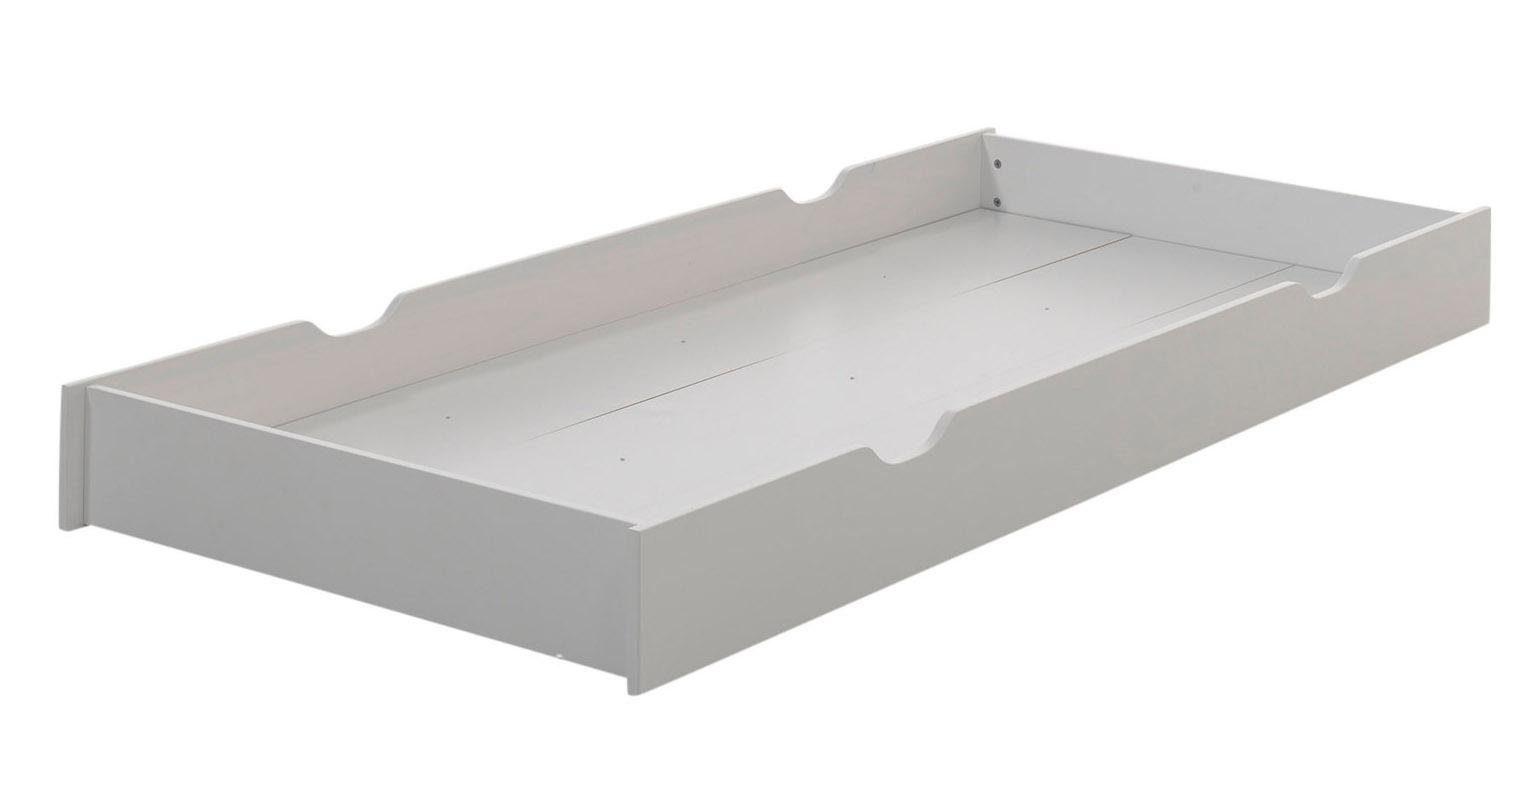 Vipack Bettschubkasten »Stella«, MDF-Oberfläche